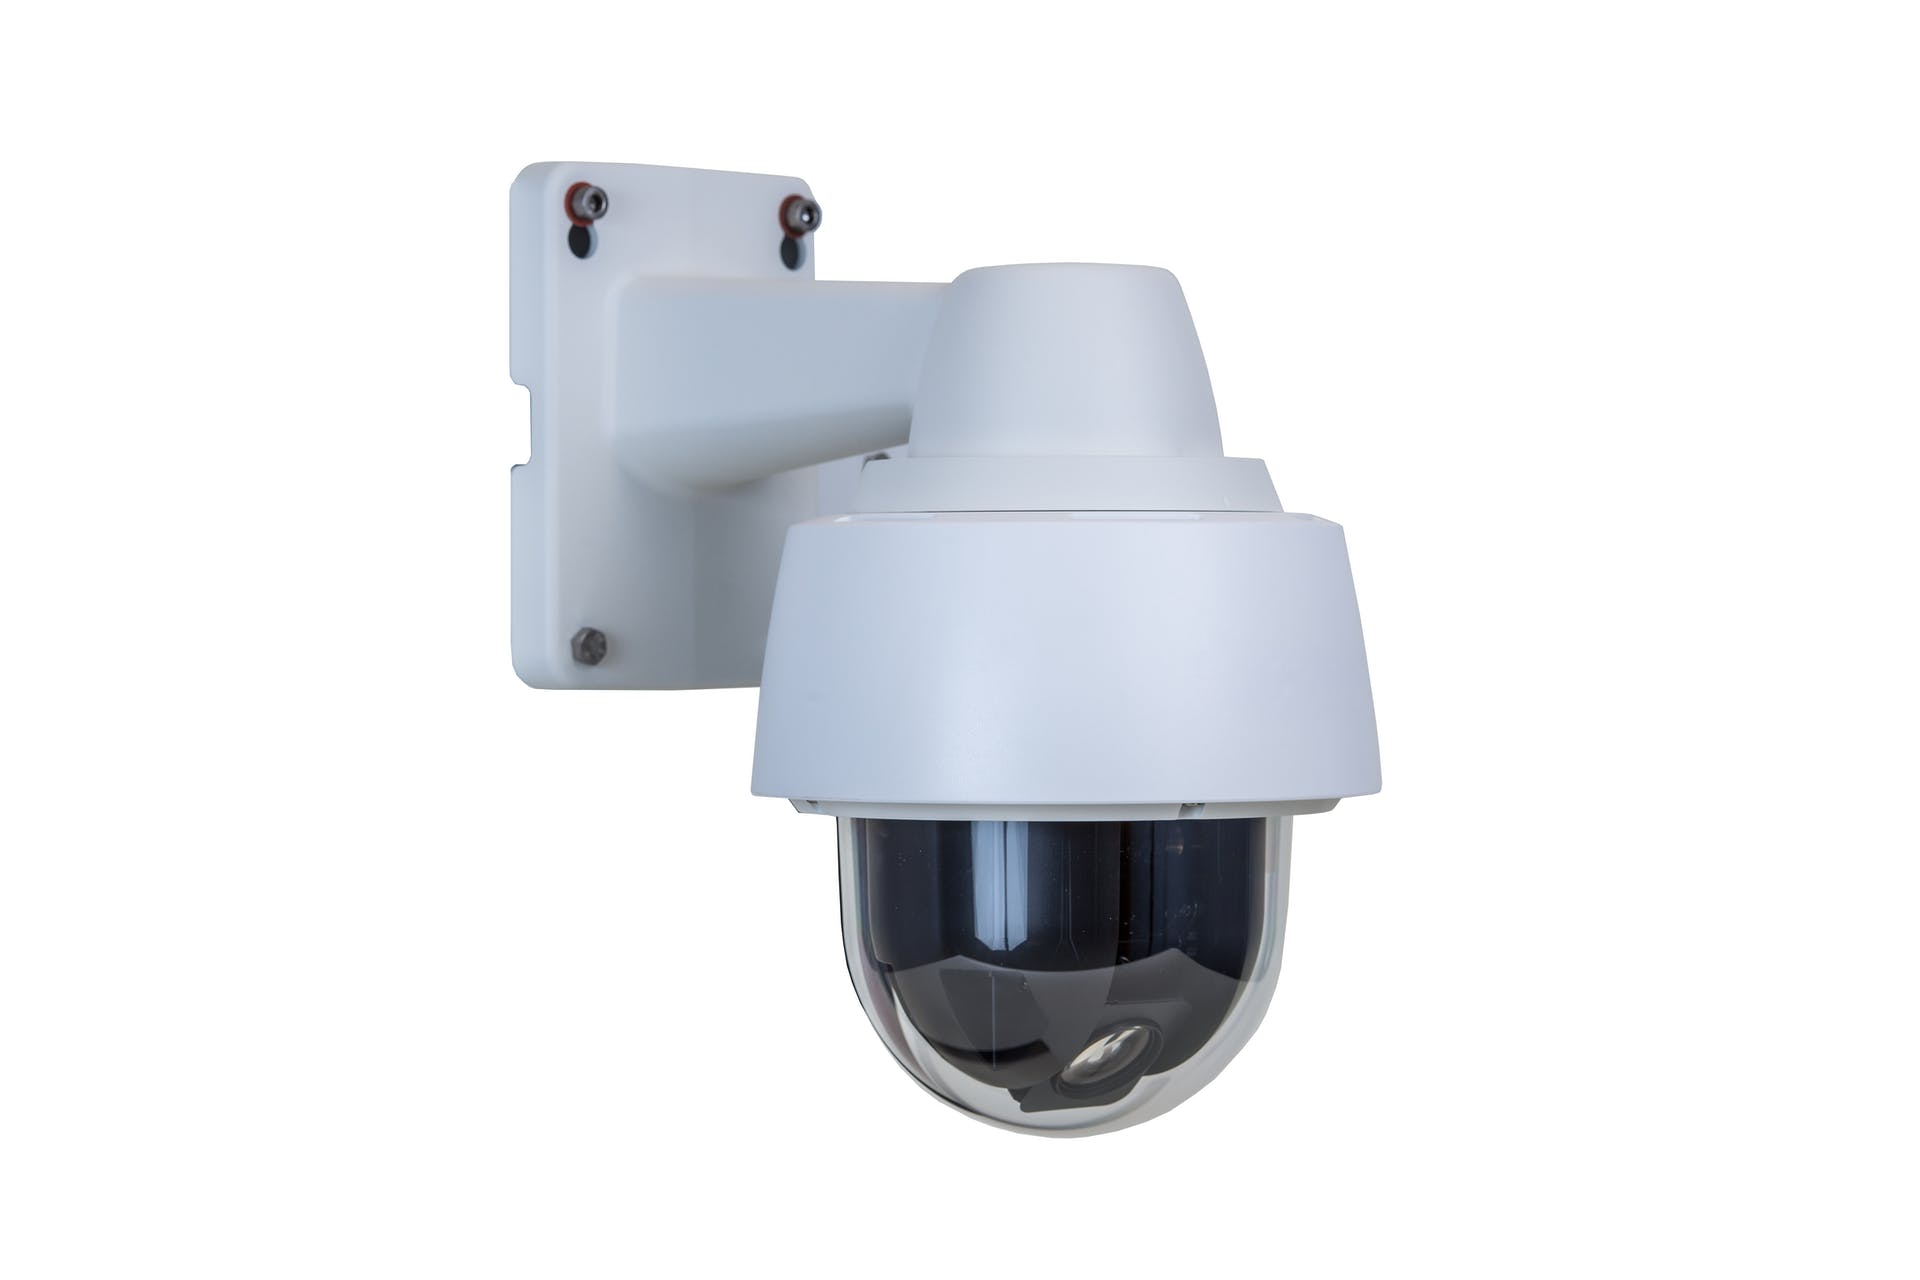 Internal-PTZ-Dome-Camera_0482-6025-001